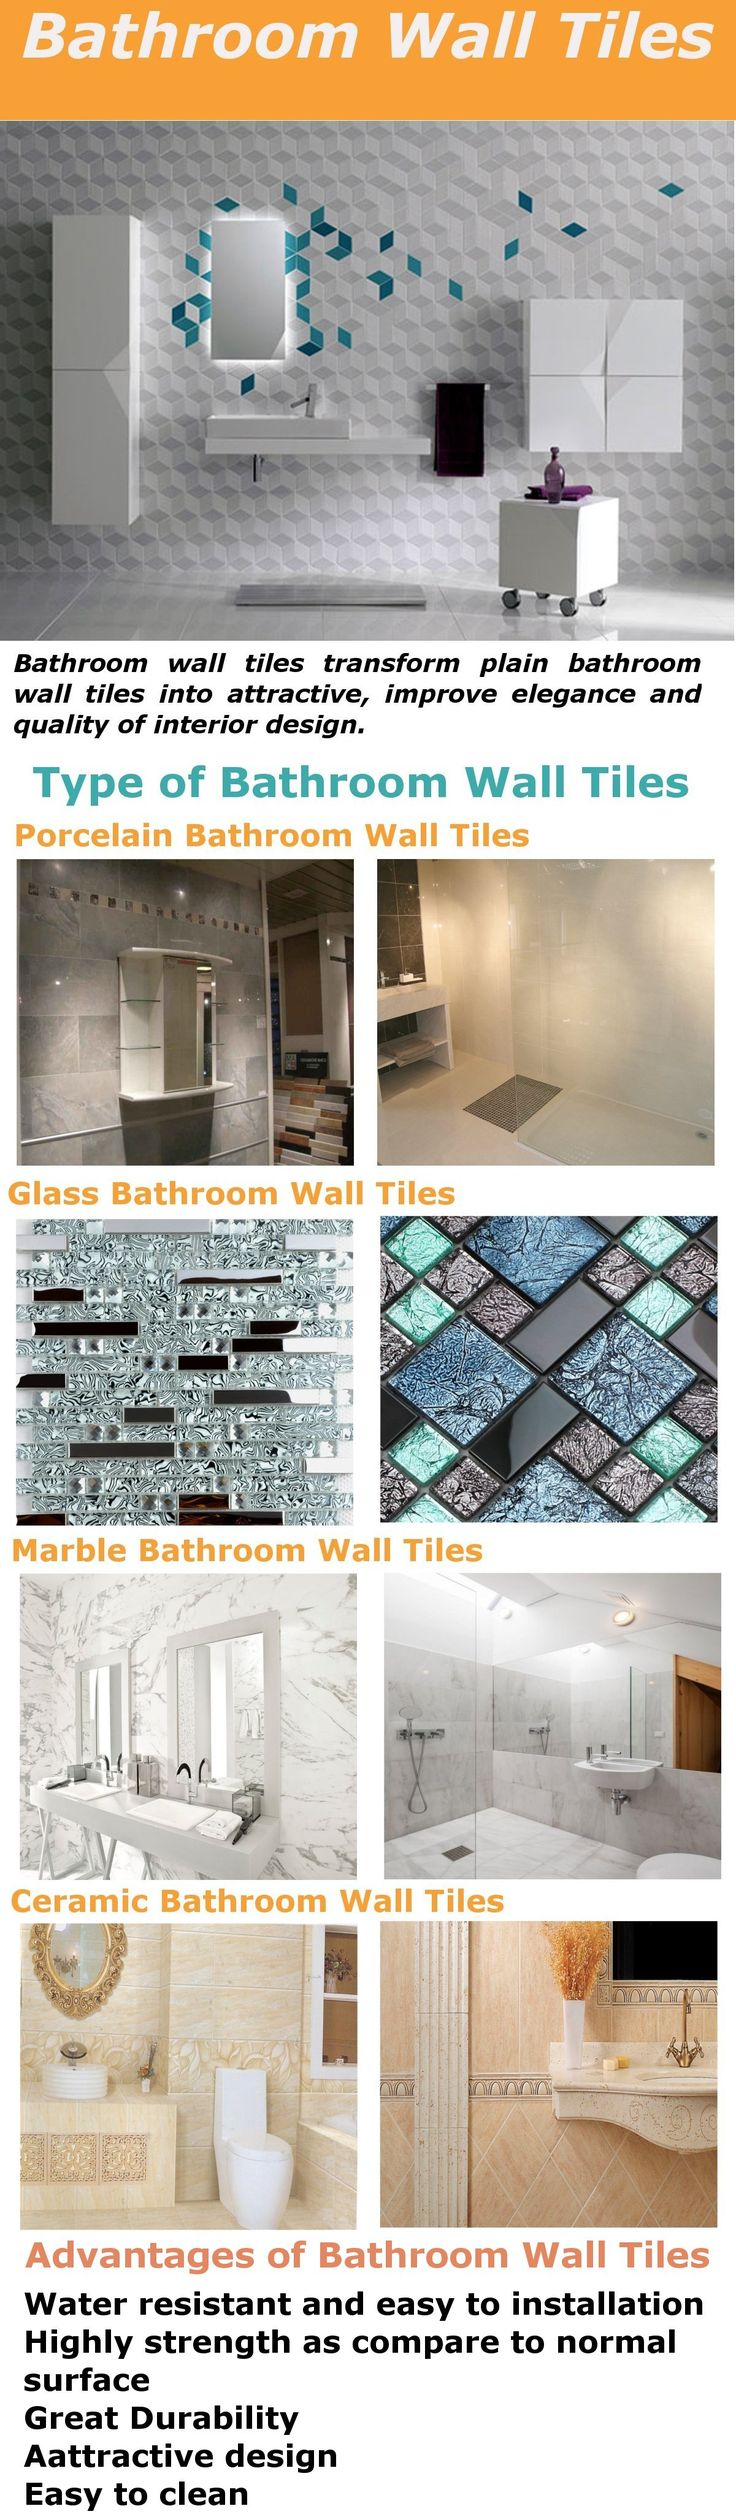 15 best Construction Suppliers images on Pinterest | Tiles ...